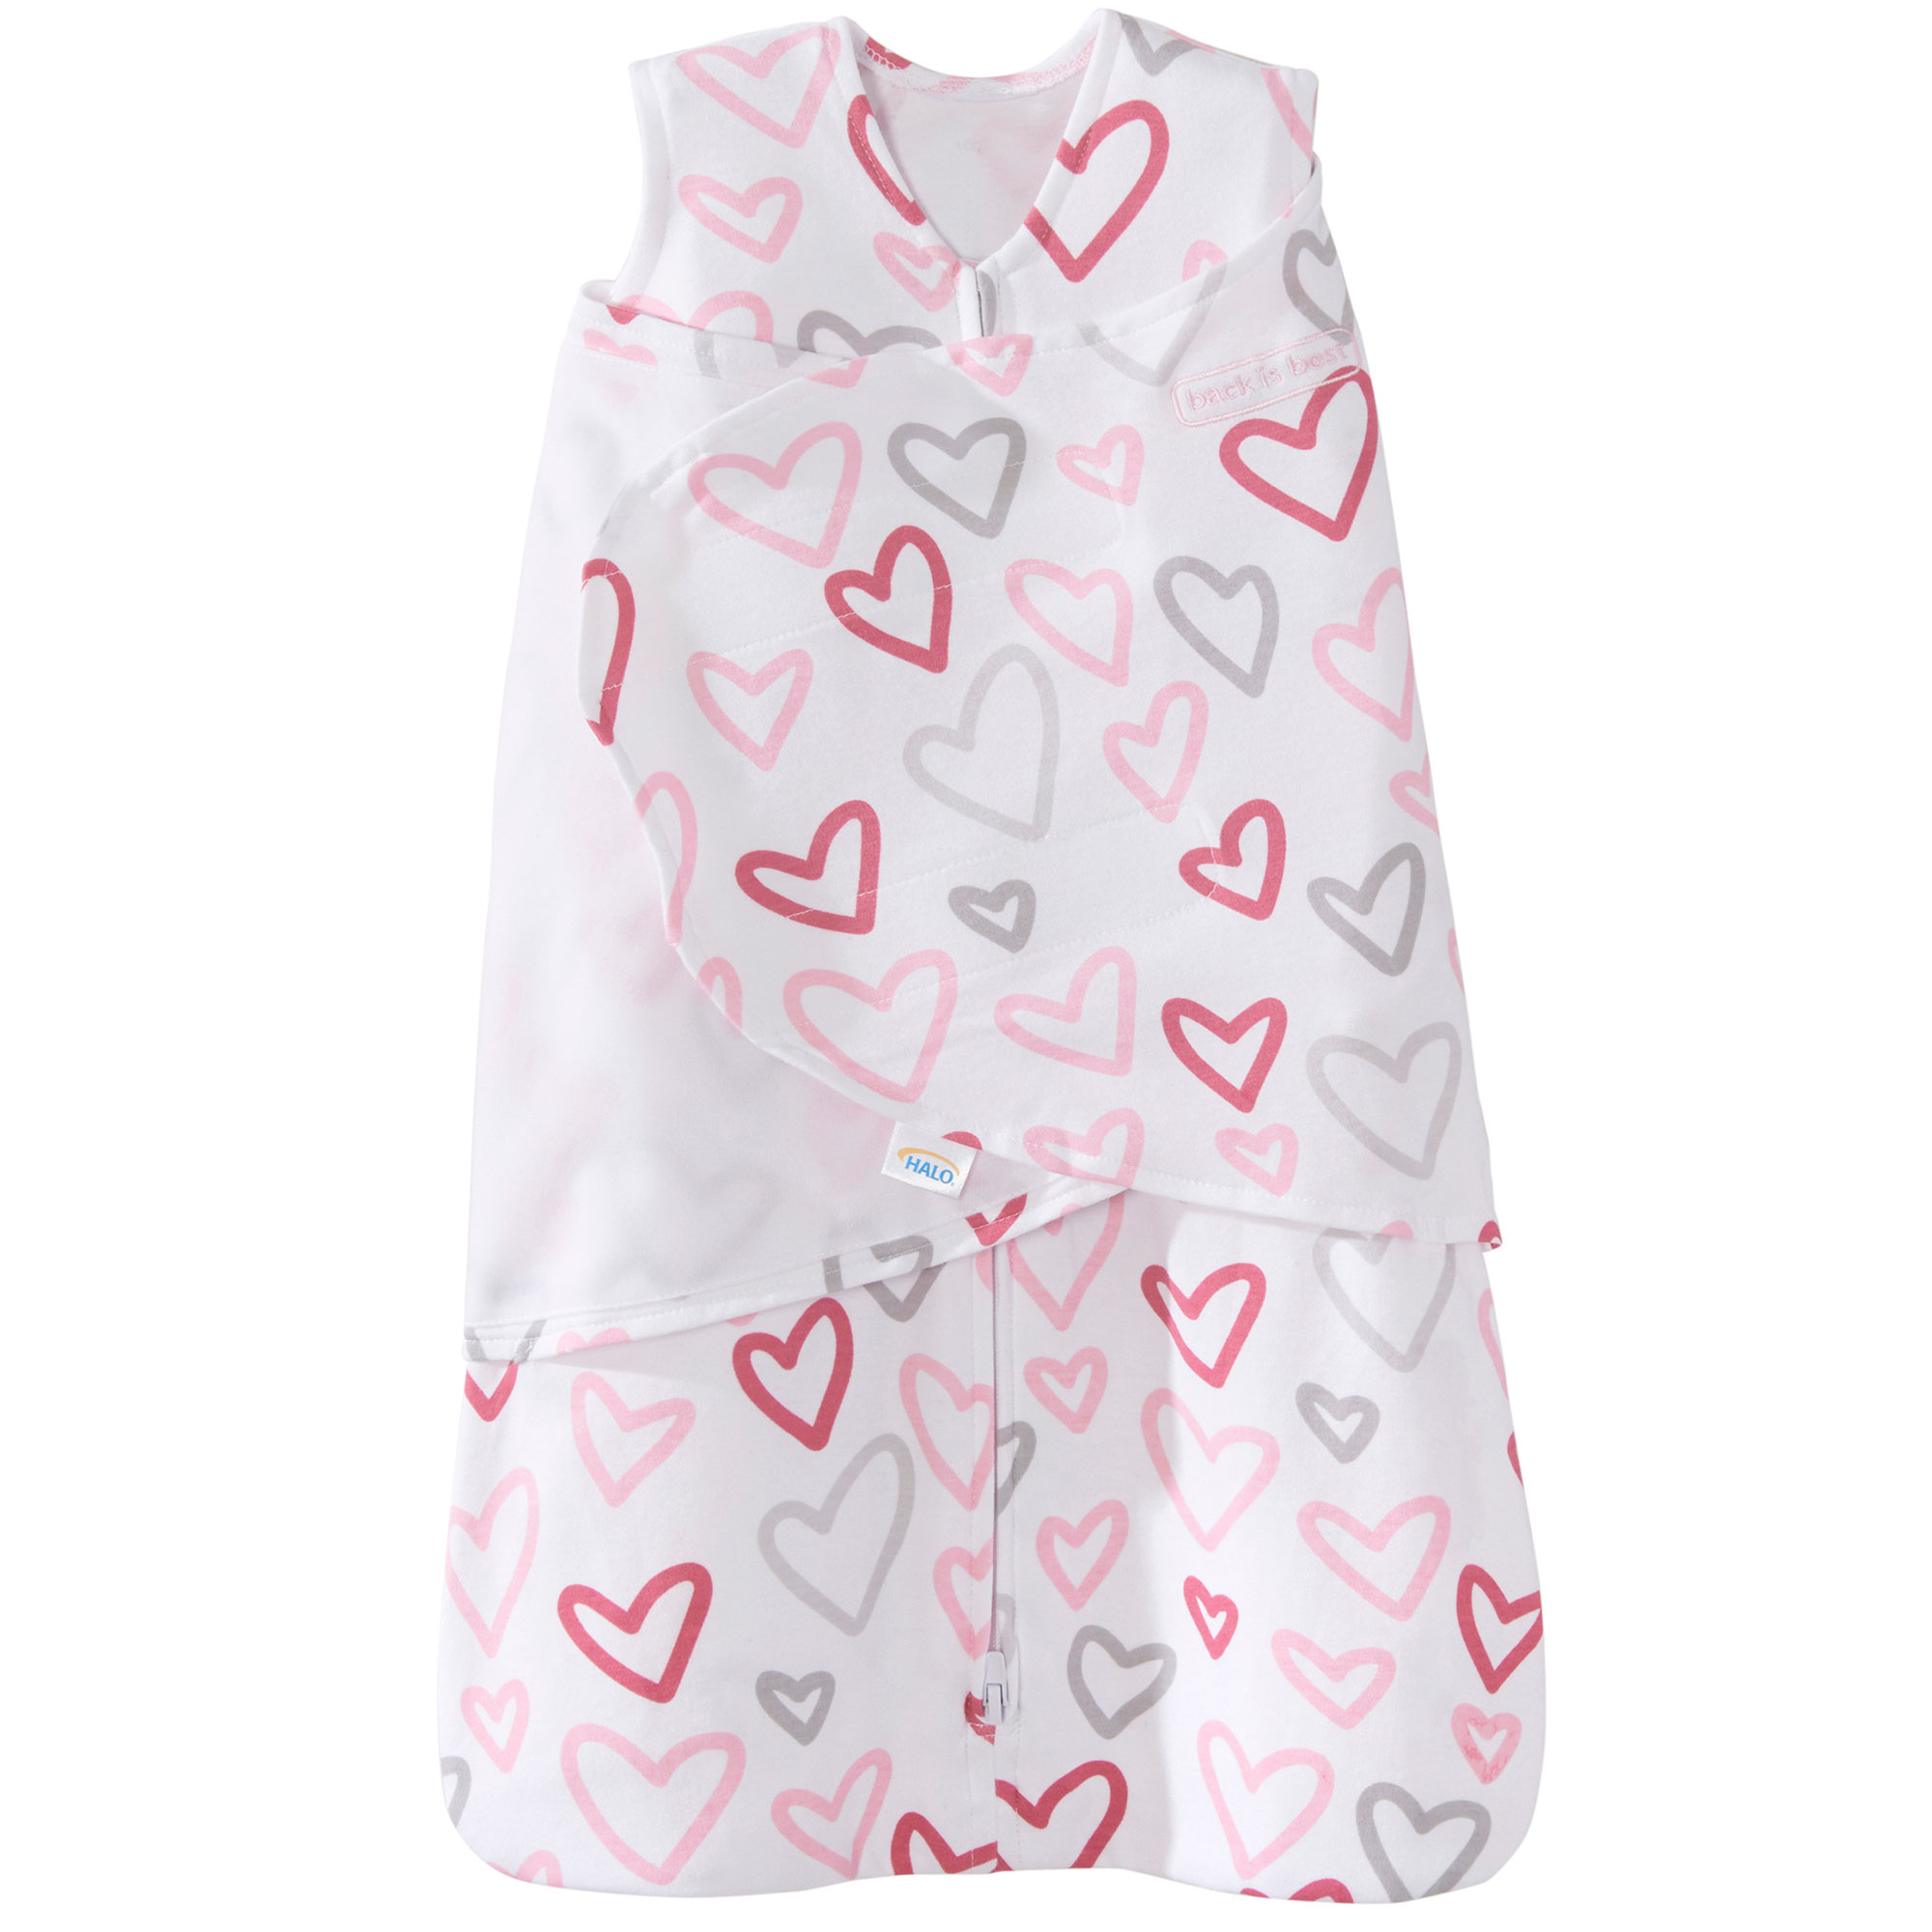 Halo 100% Cotton Baby Sleepsack Swaddle Wearable Blanket, Modern Pink Hearts, Newborn